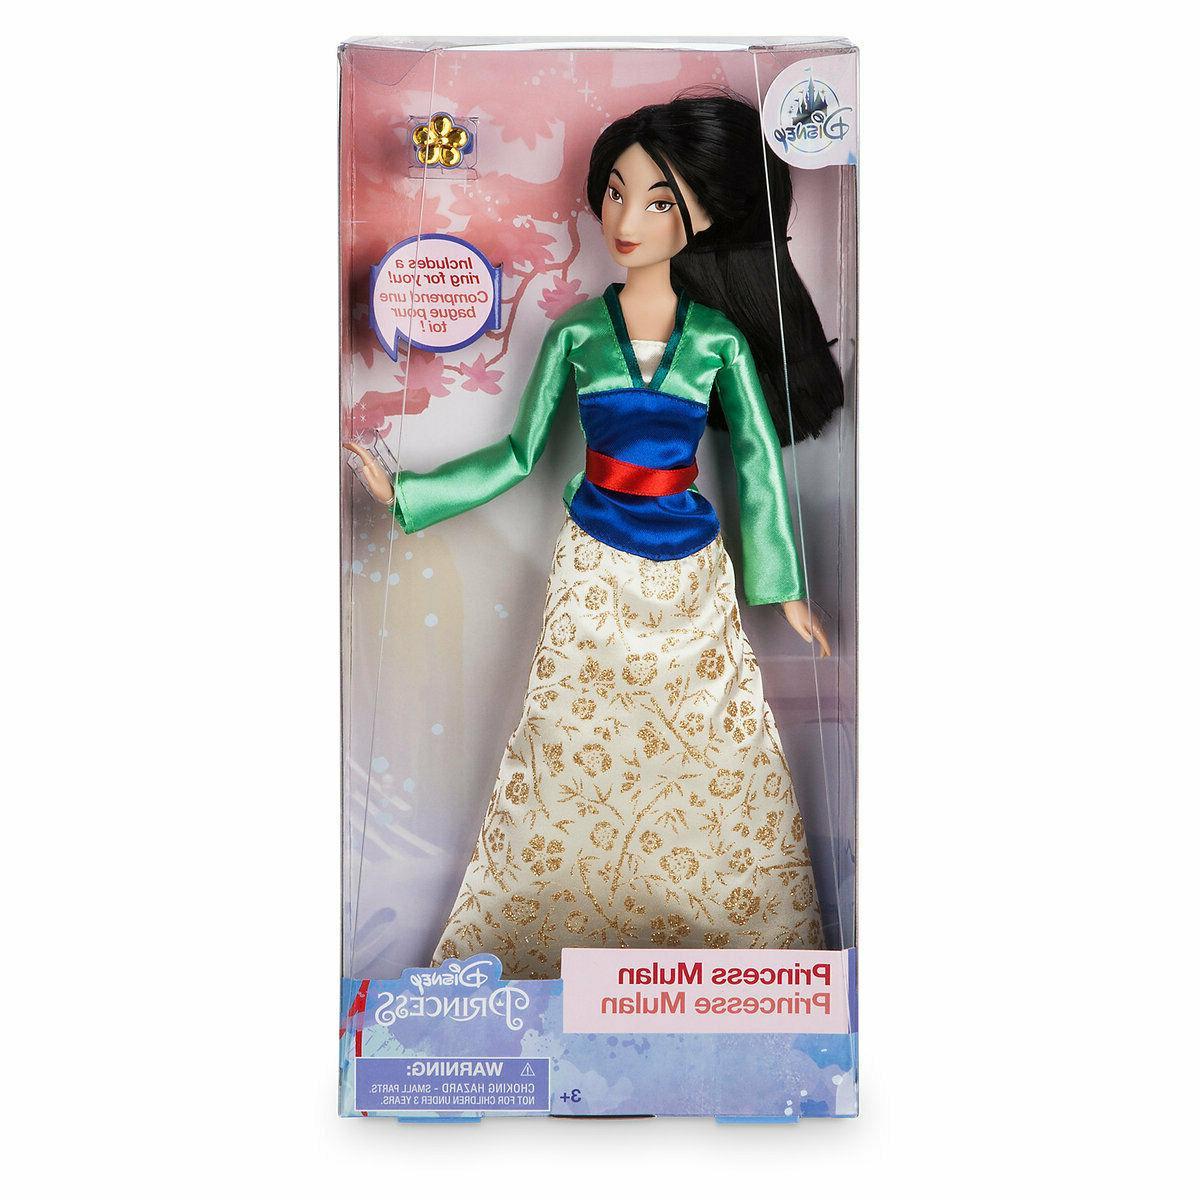 Disney Store Princess Mulan Classic Doll With Ring, 11.5 Inc